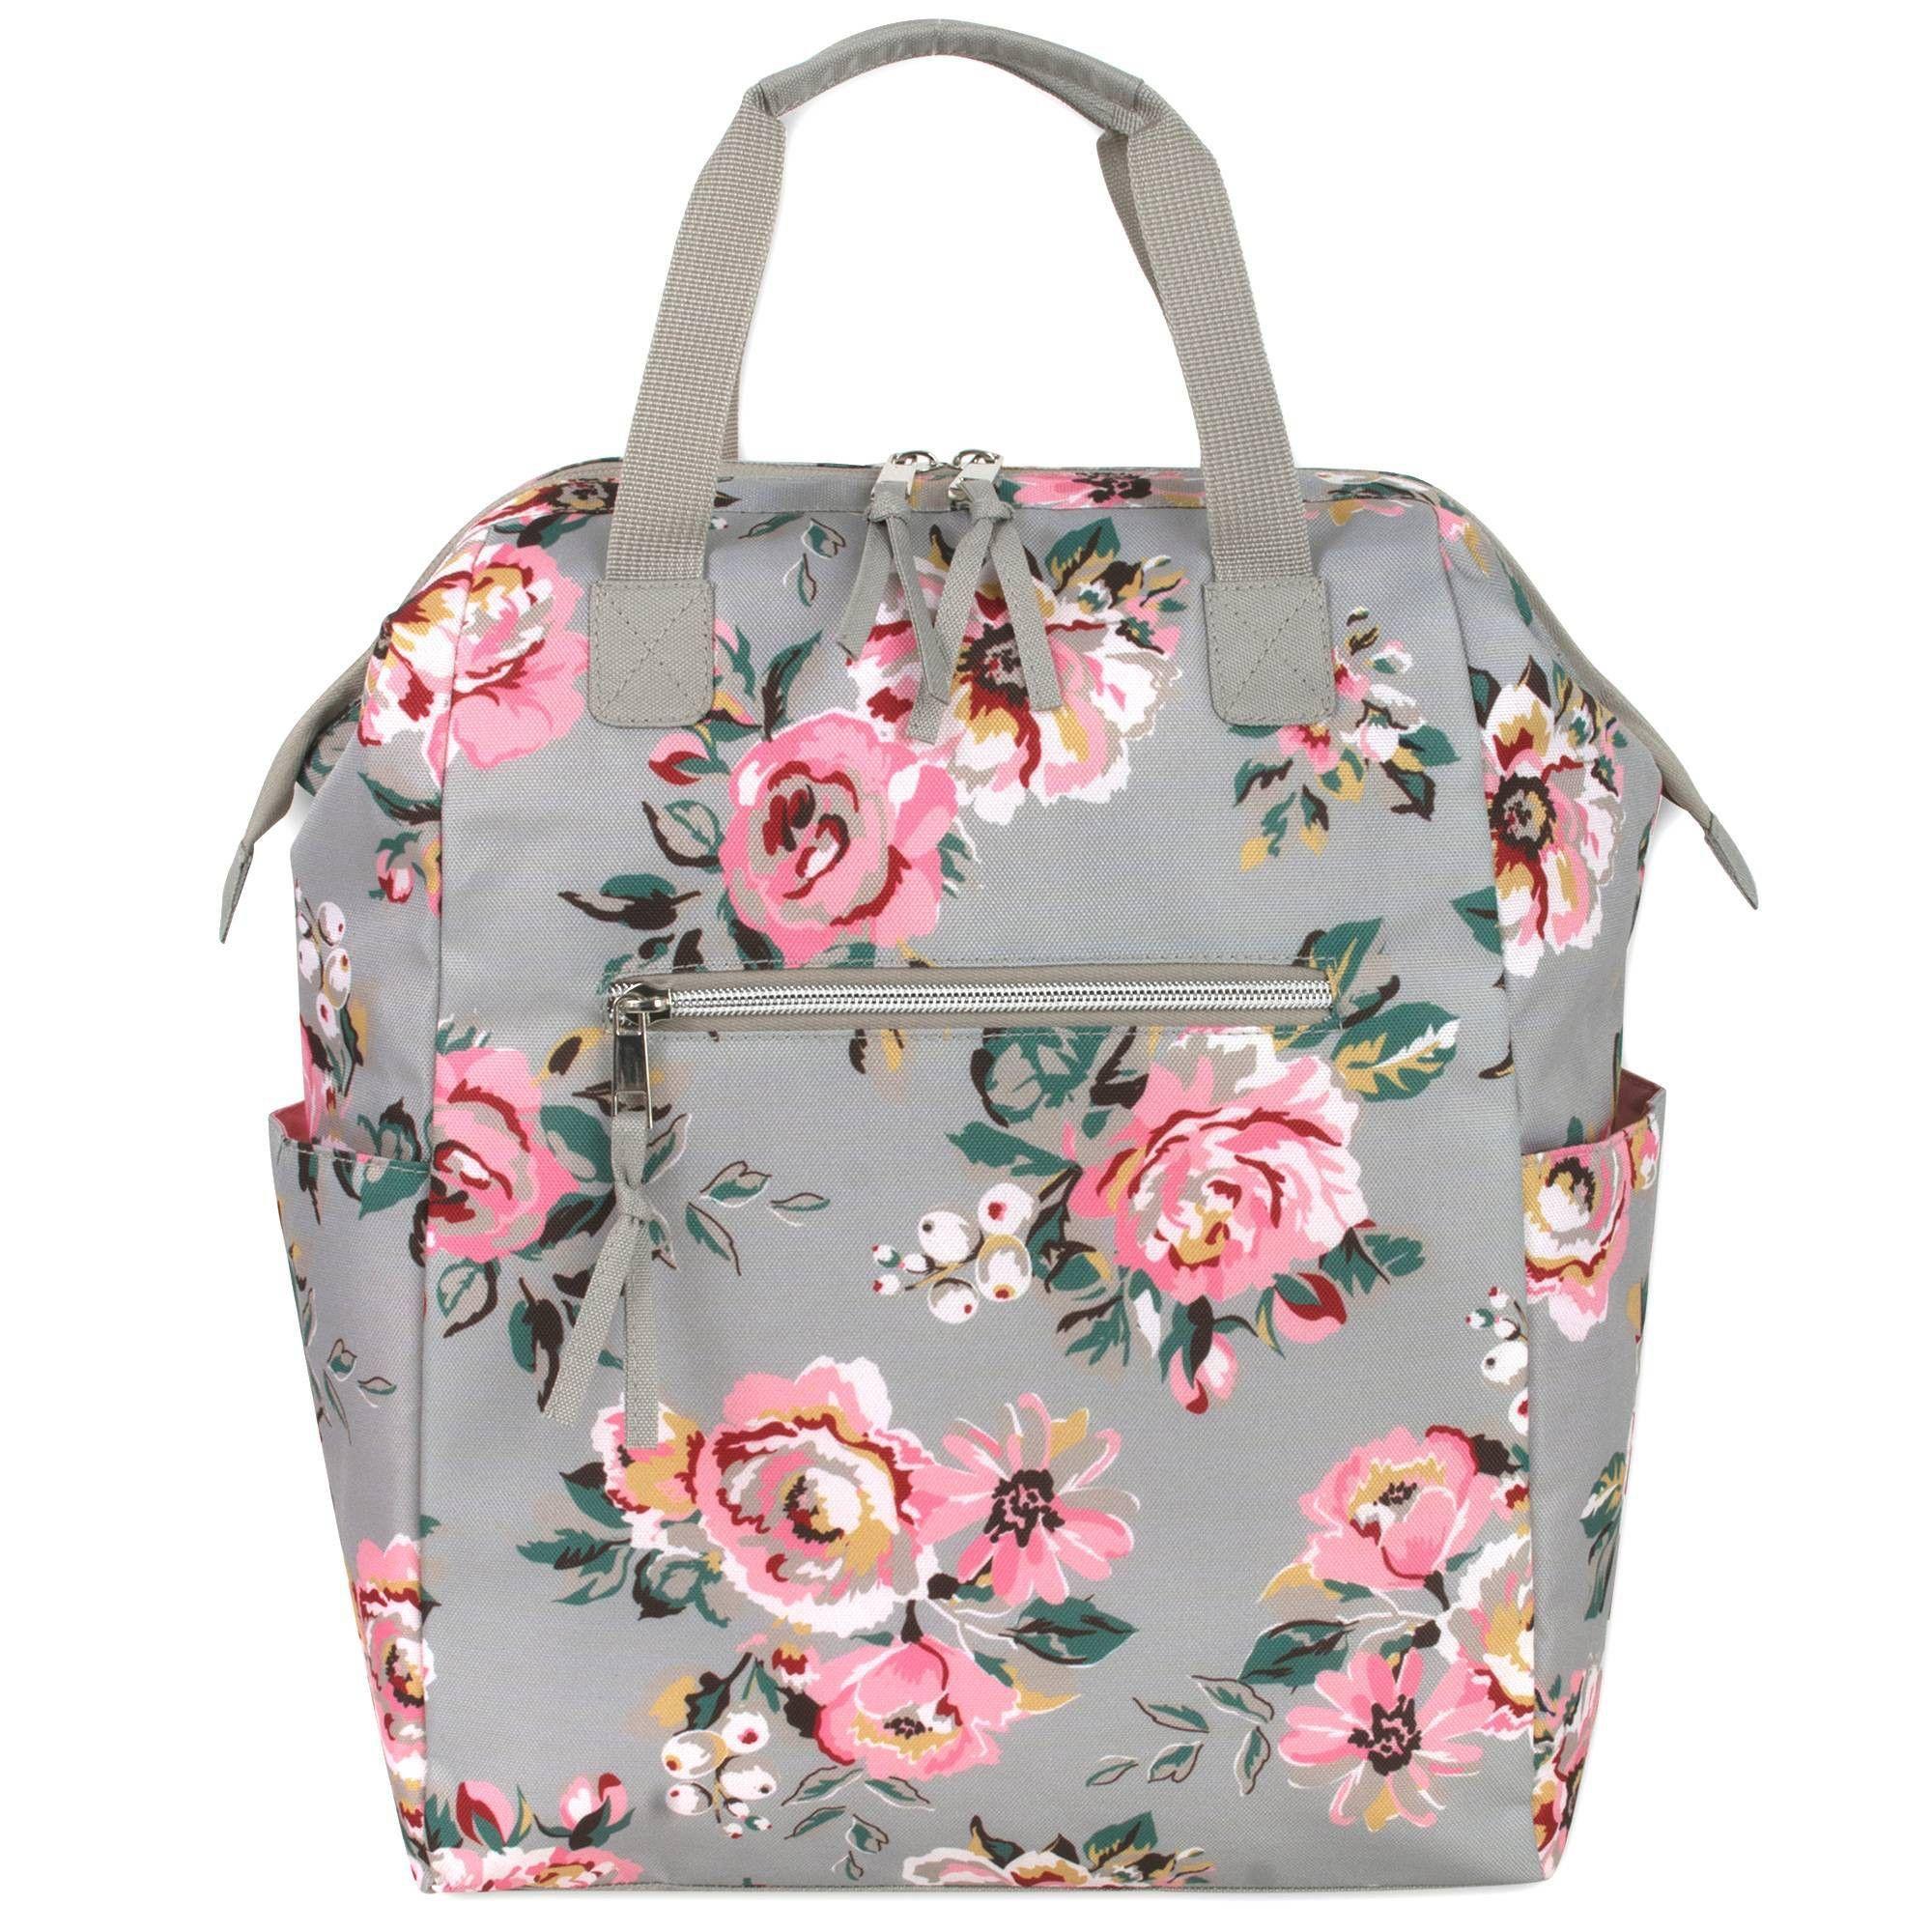 Baby essentials floral wide frame diaper bag backpack in